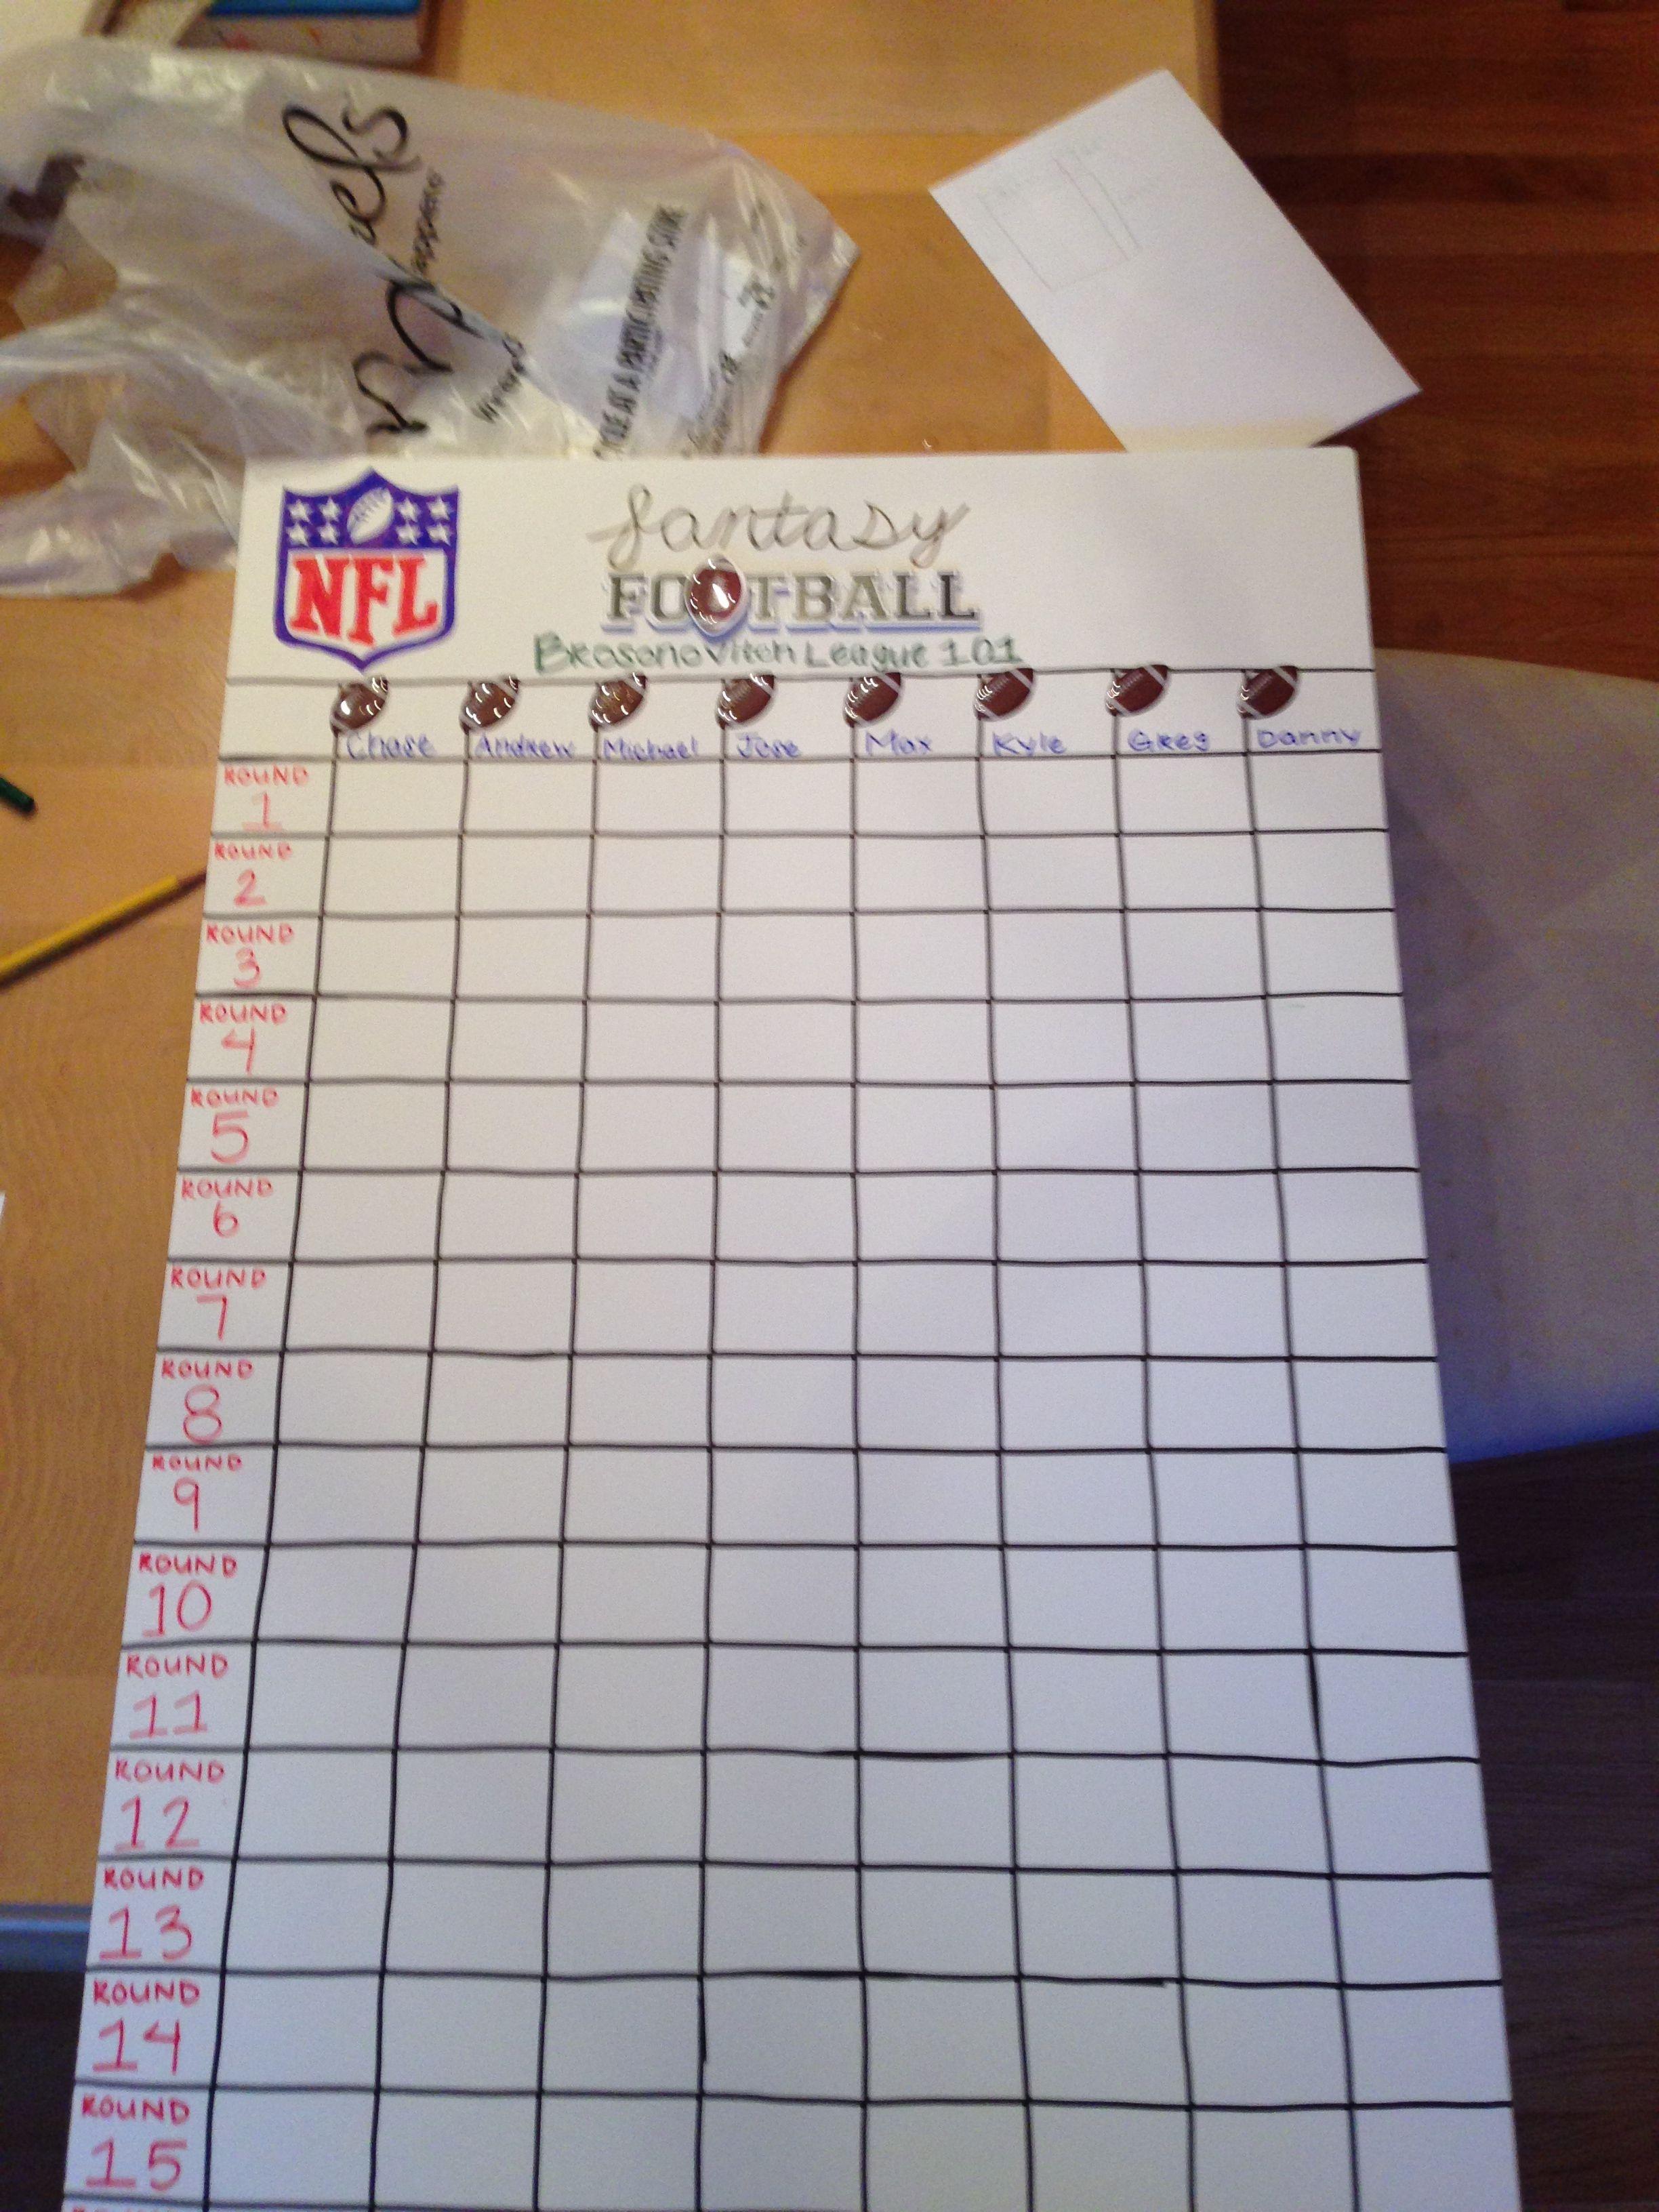 Fantasy Football Draft Board I Made For My Friends' Fantasy League - Free Fantasy Football Draft Kit Printable